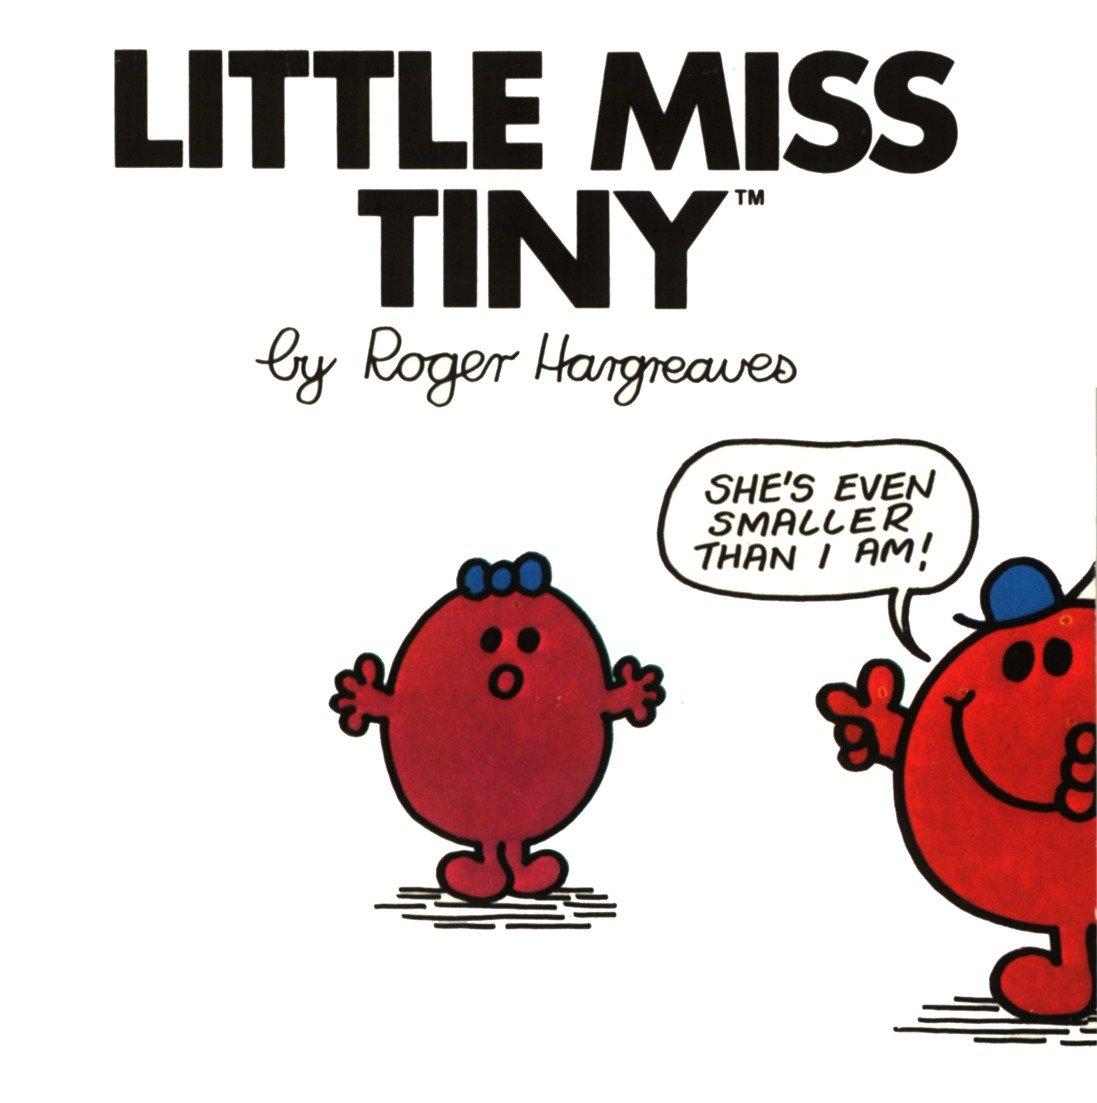 Little Miss Tiny